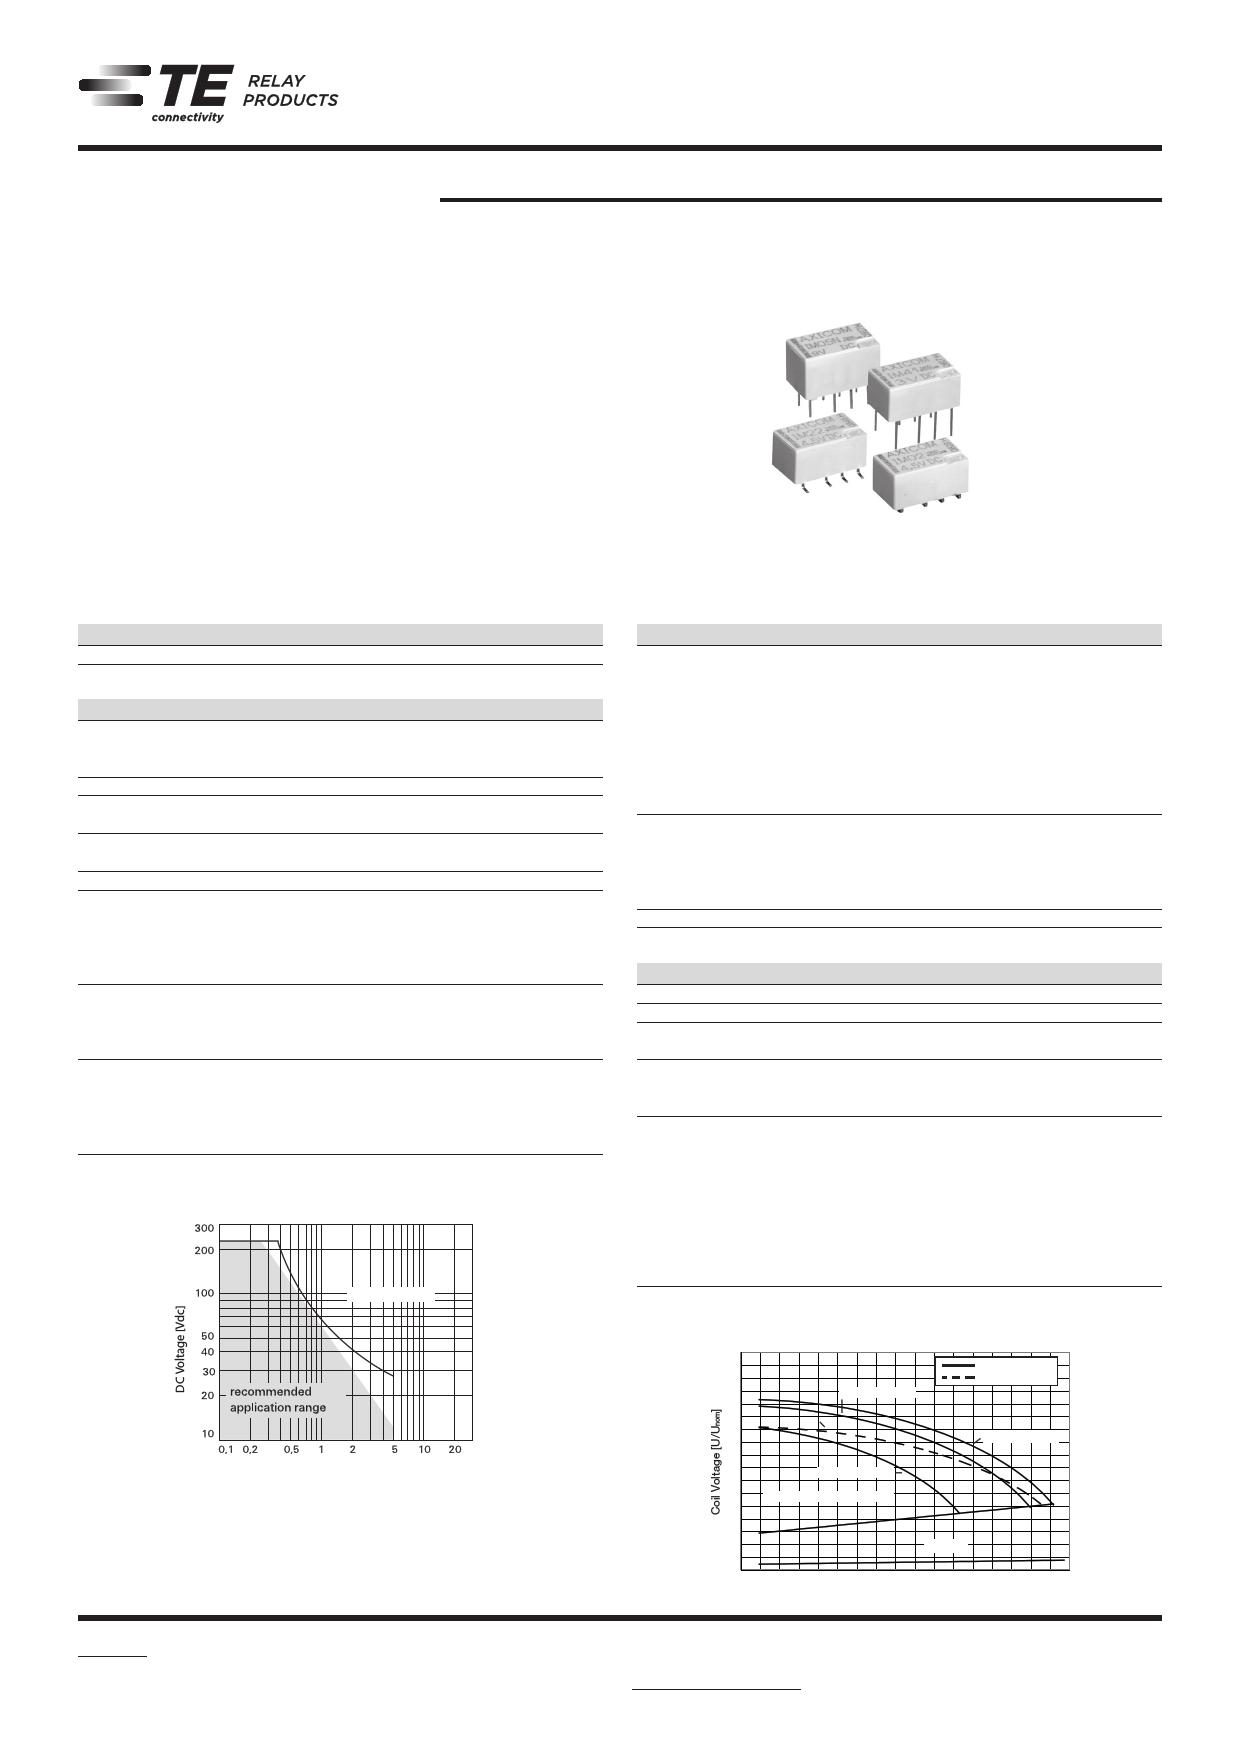 1-1462038-3 Даташит, Описание, Даташиты